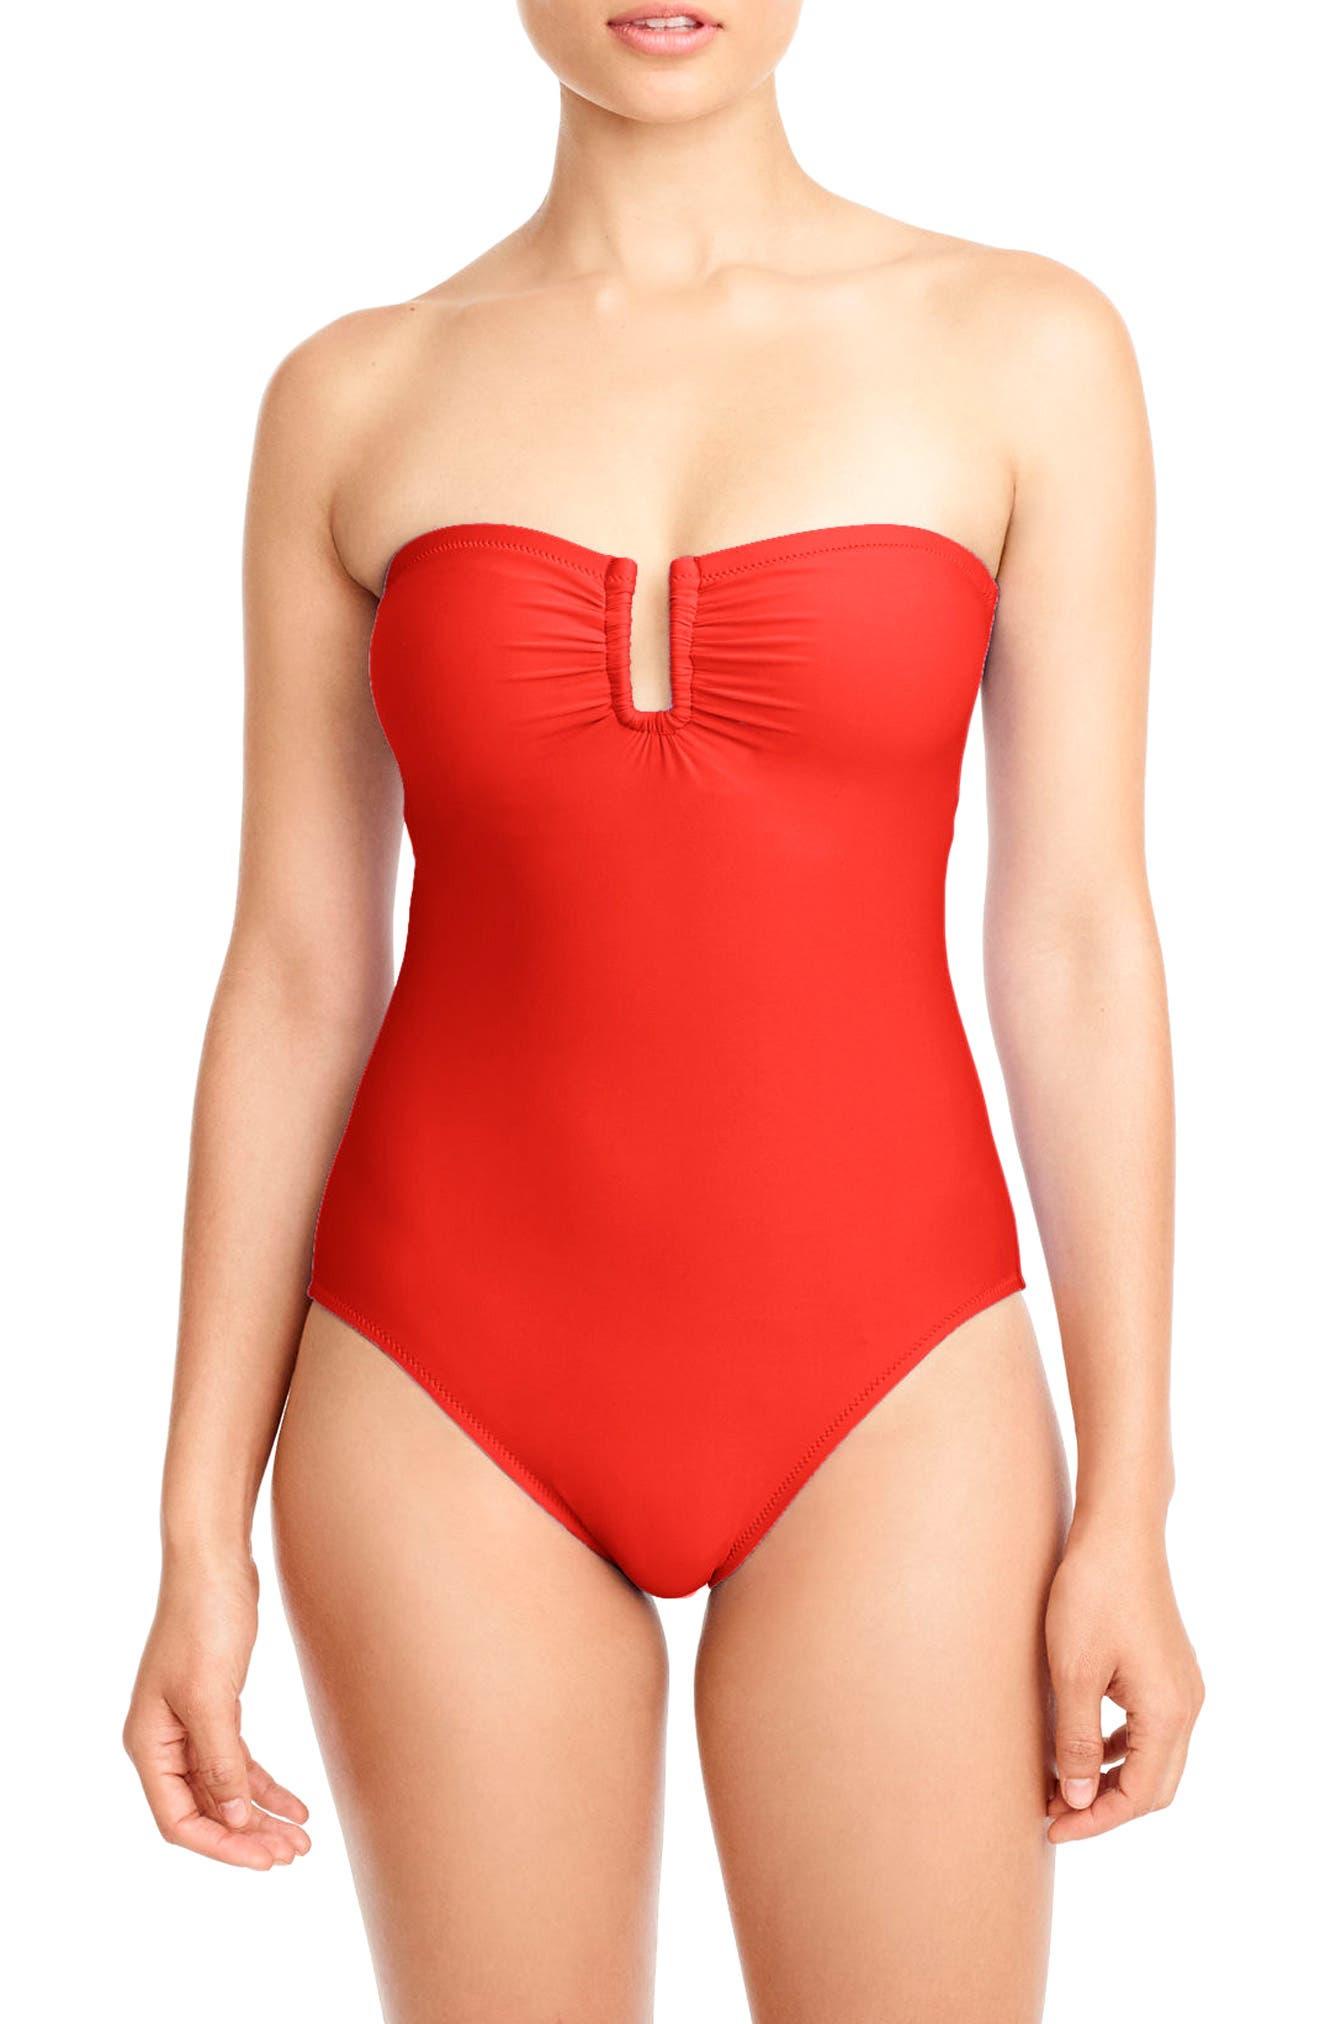 J.Crew U-Front Bandeau One-Piece Swimsuit,                         Main,                         color, Belvedere Red